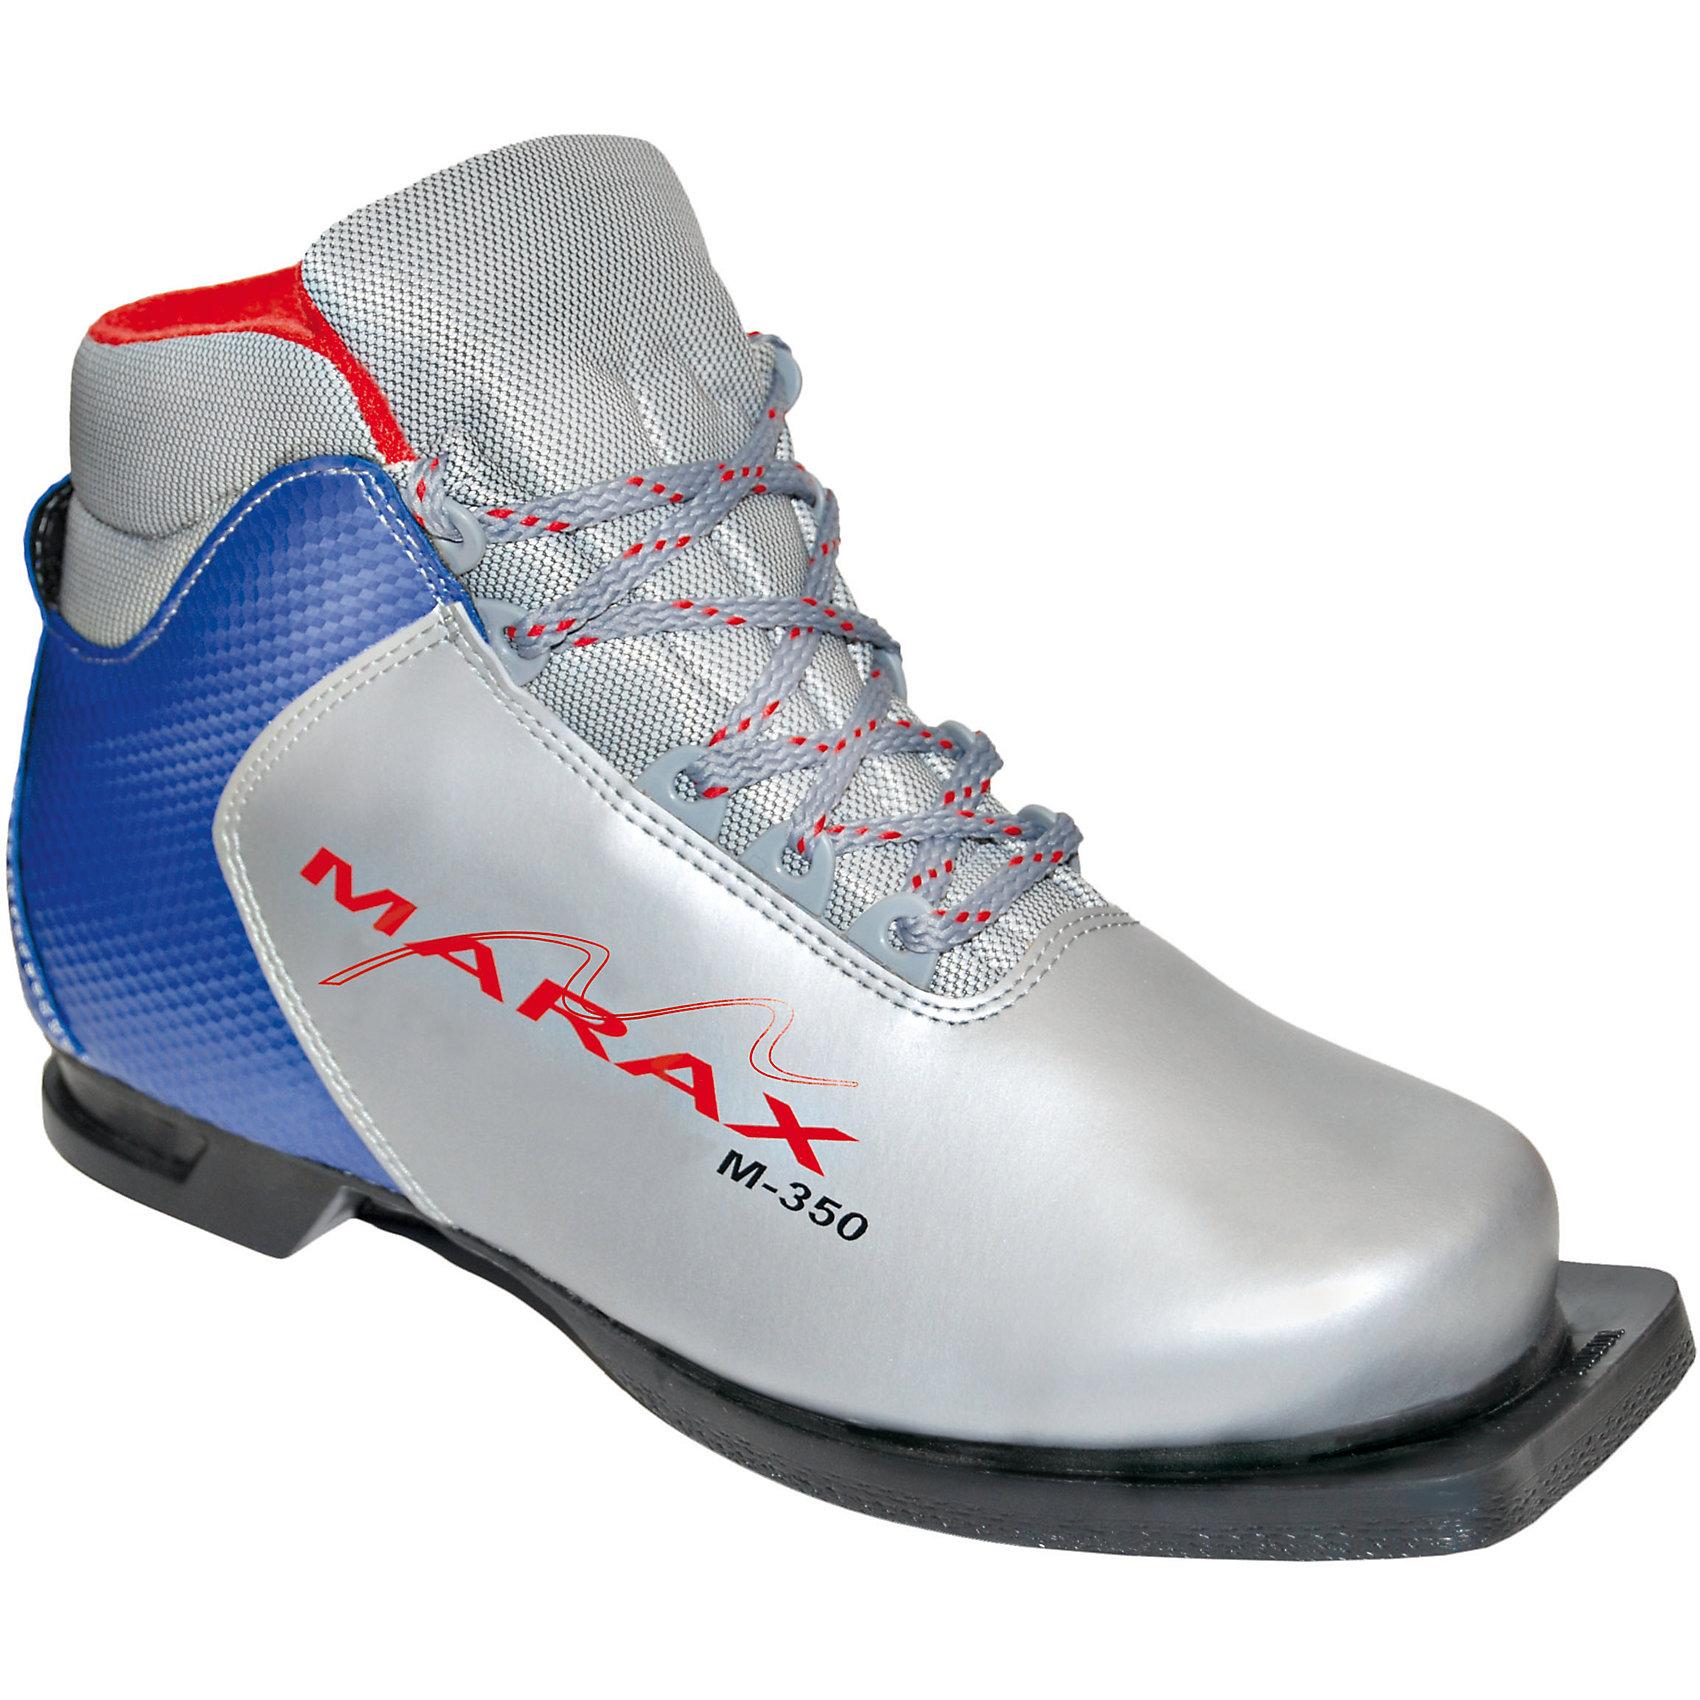 Ботинки лыжные 75мм М350, МАРАКС, серебро-синий